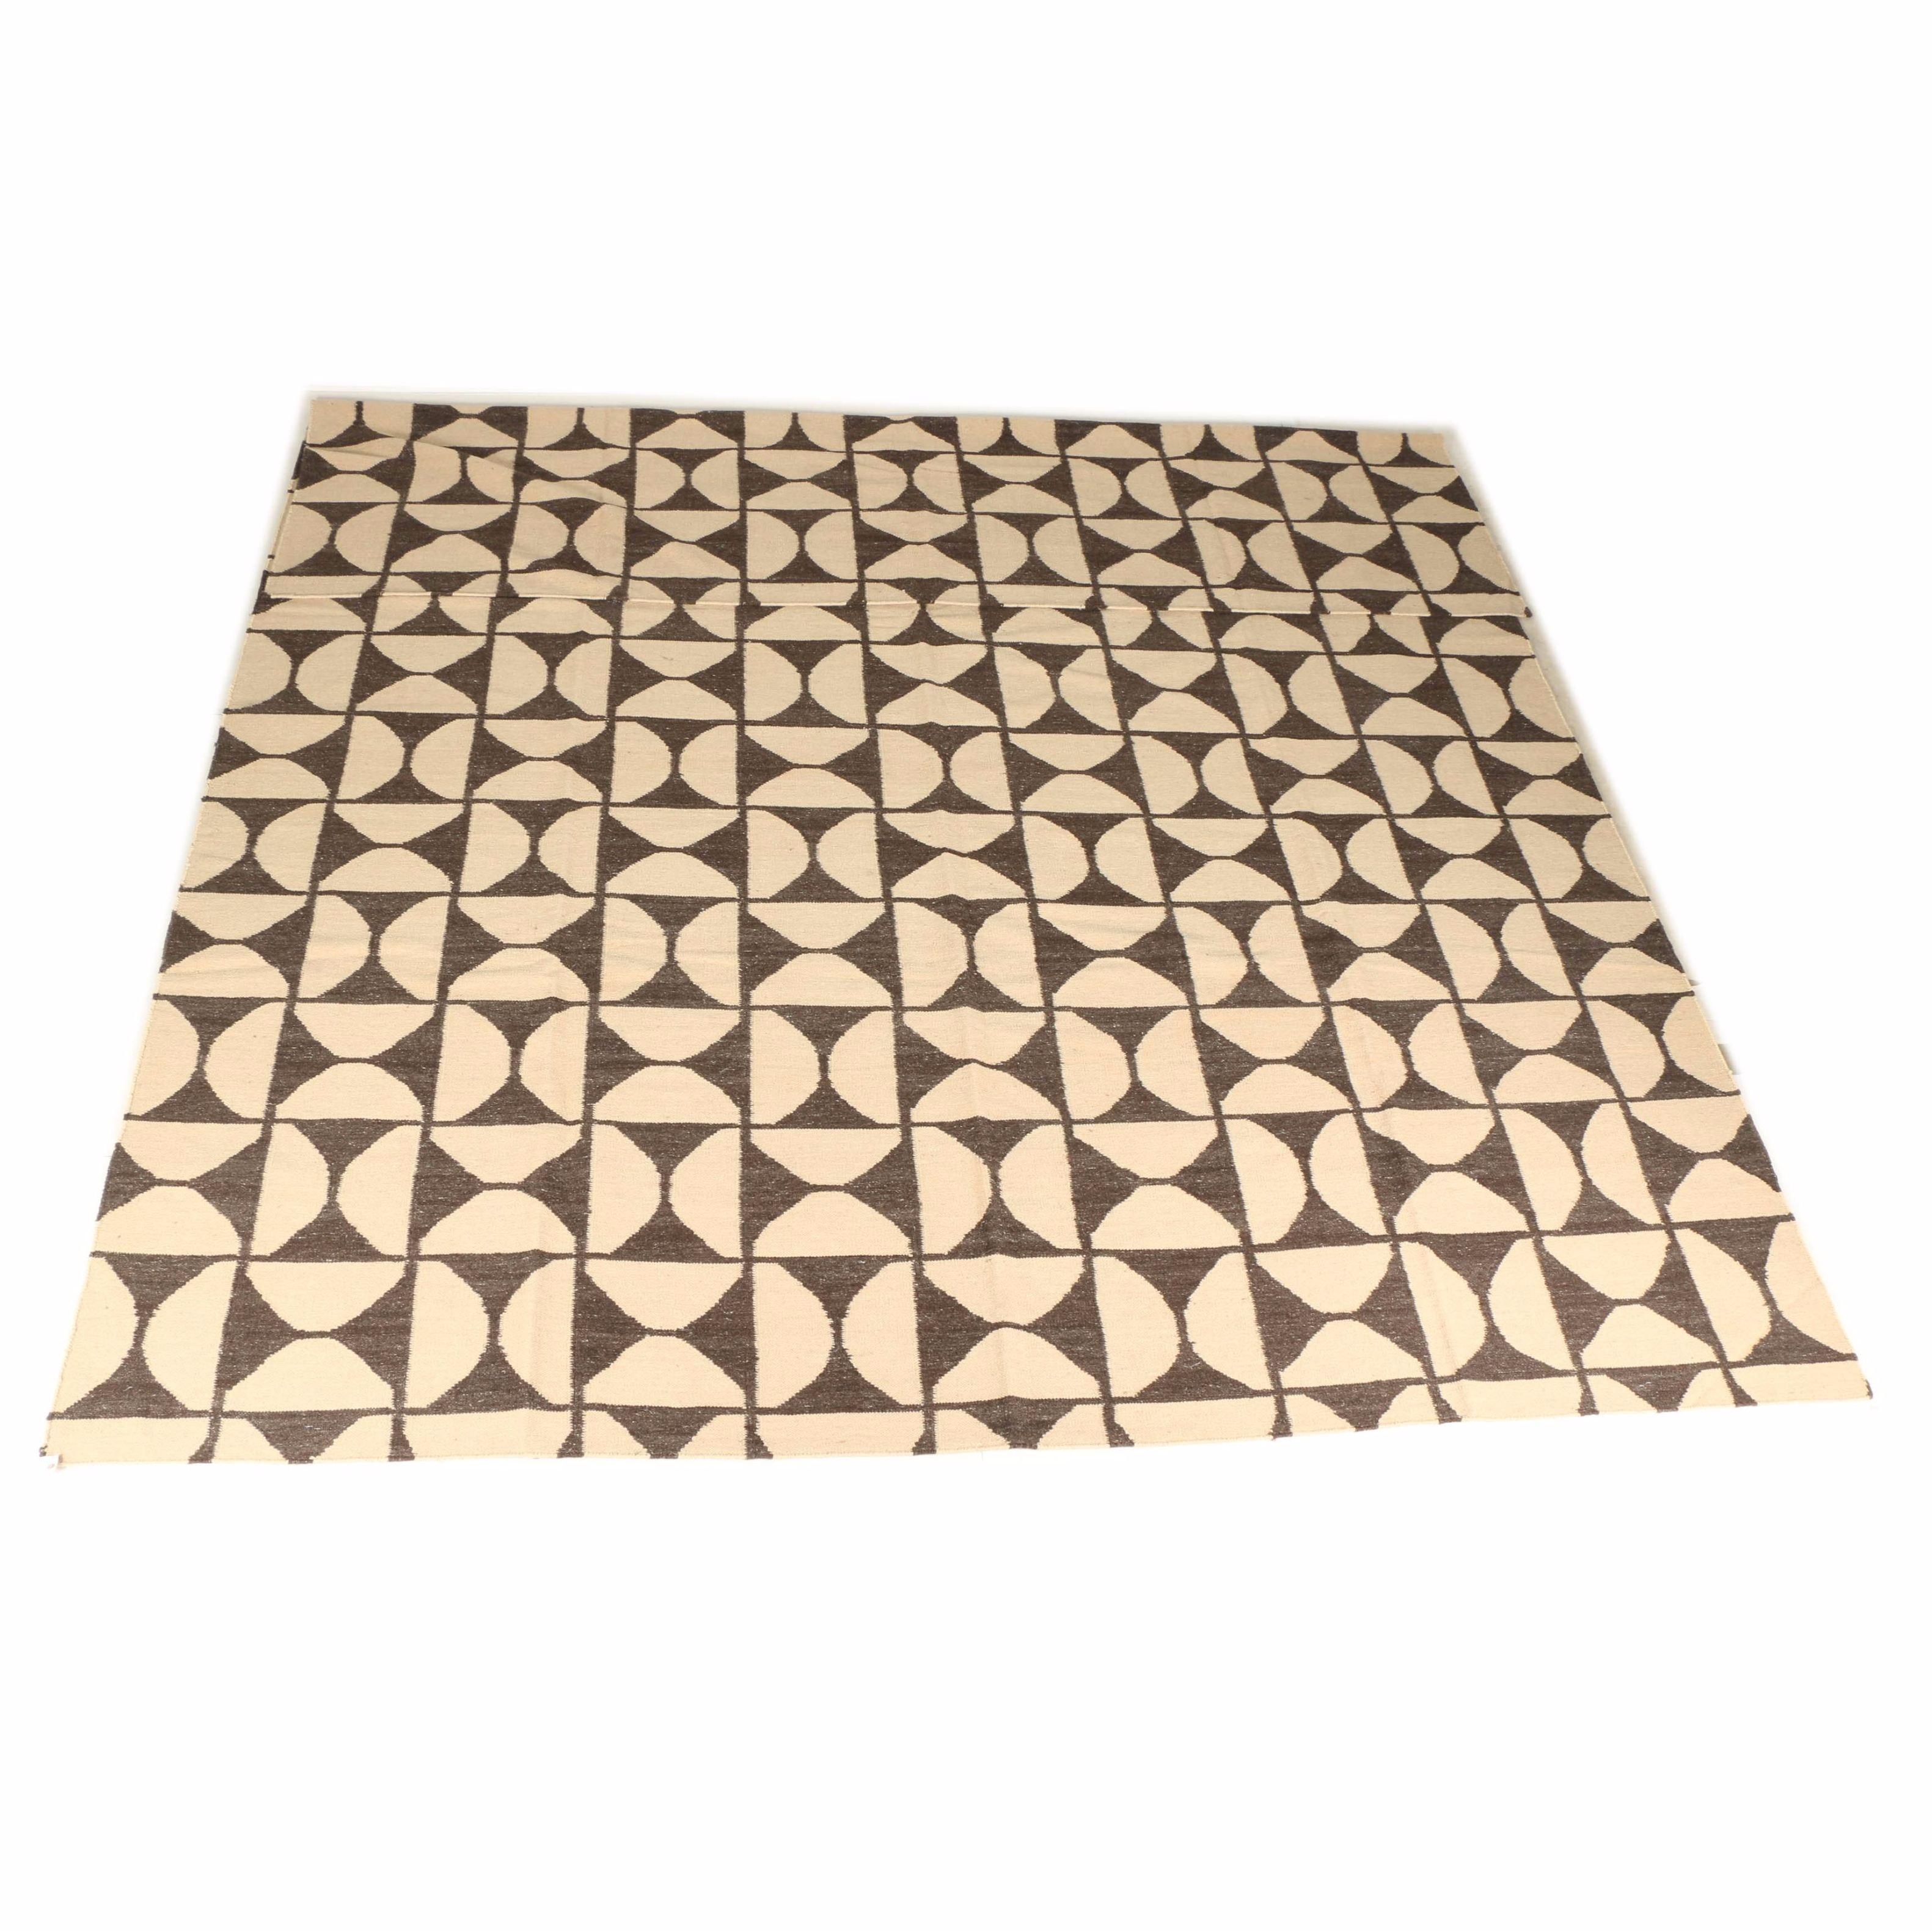 Handwoven Indian Wool Kilim Area Rug